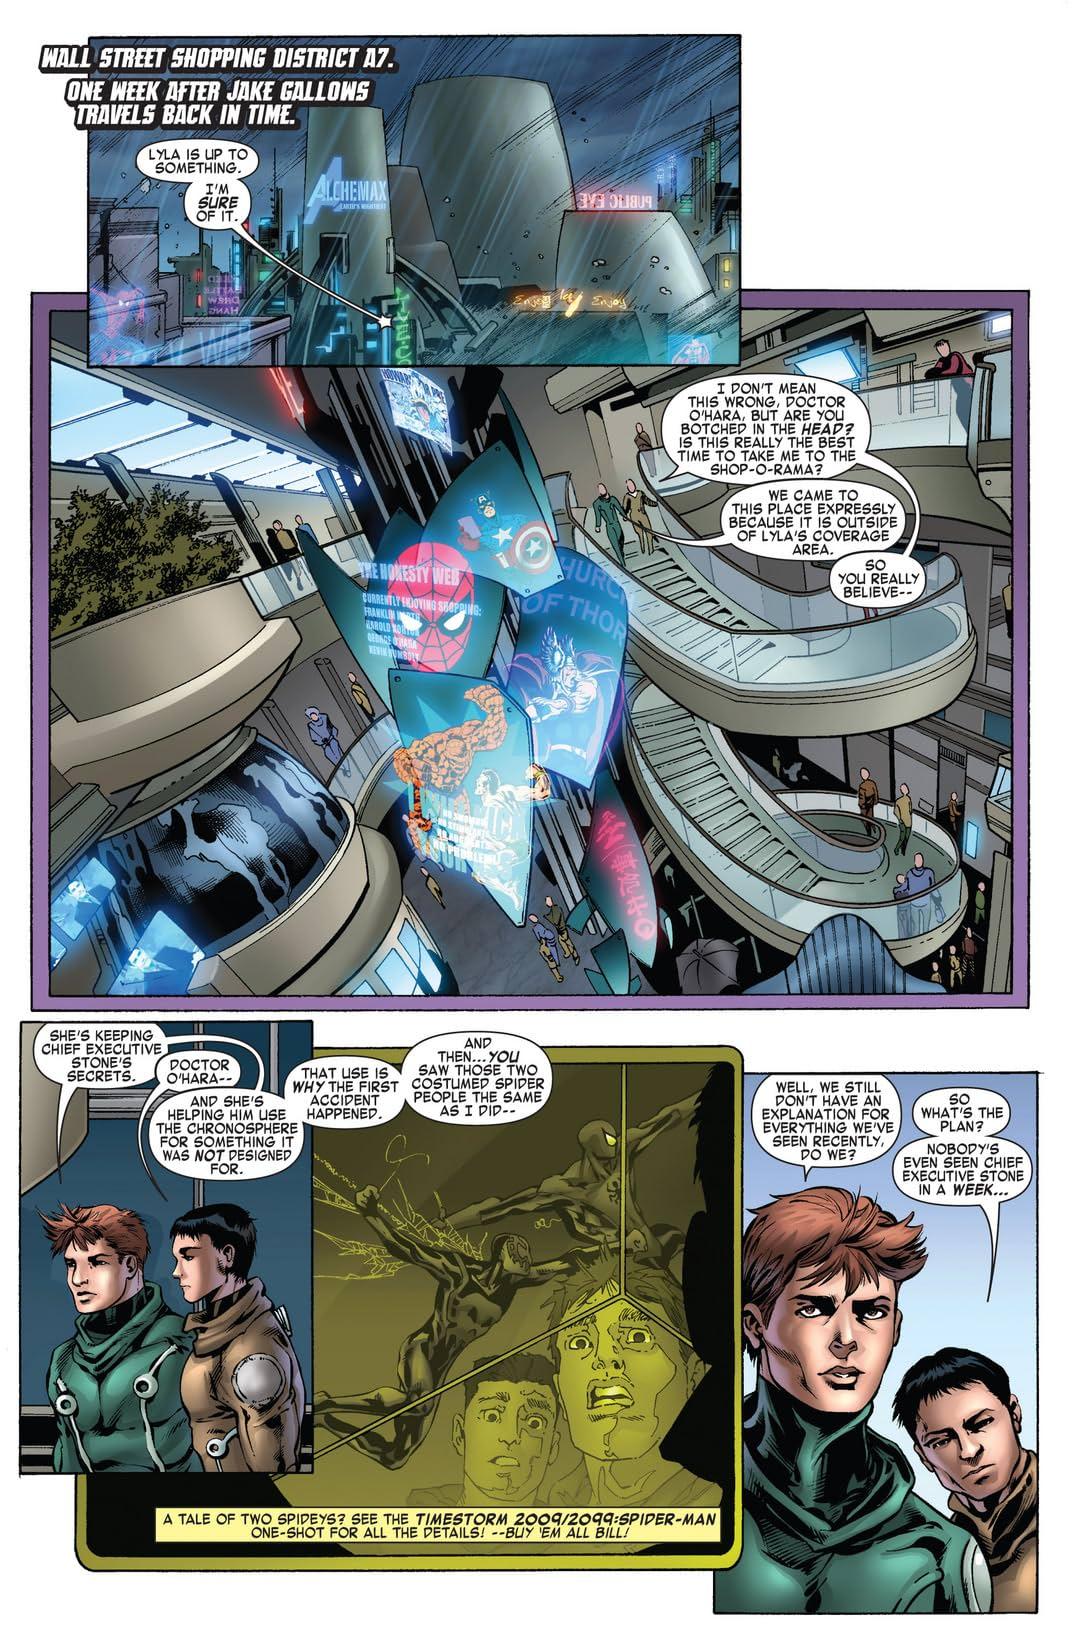 Timestorm 2009/2099 #3 (of 4)